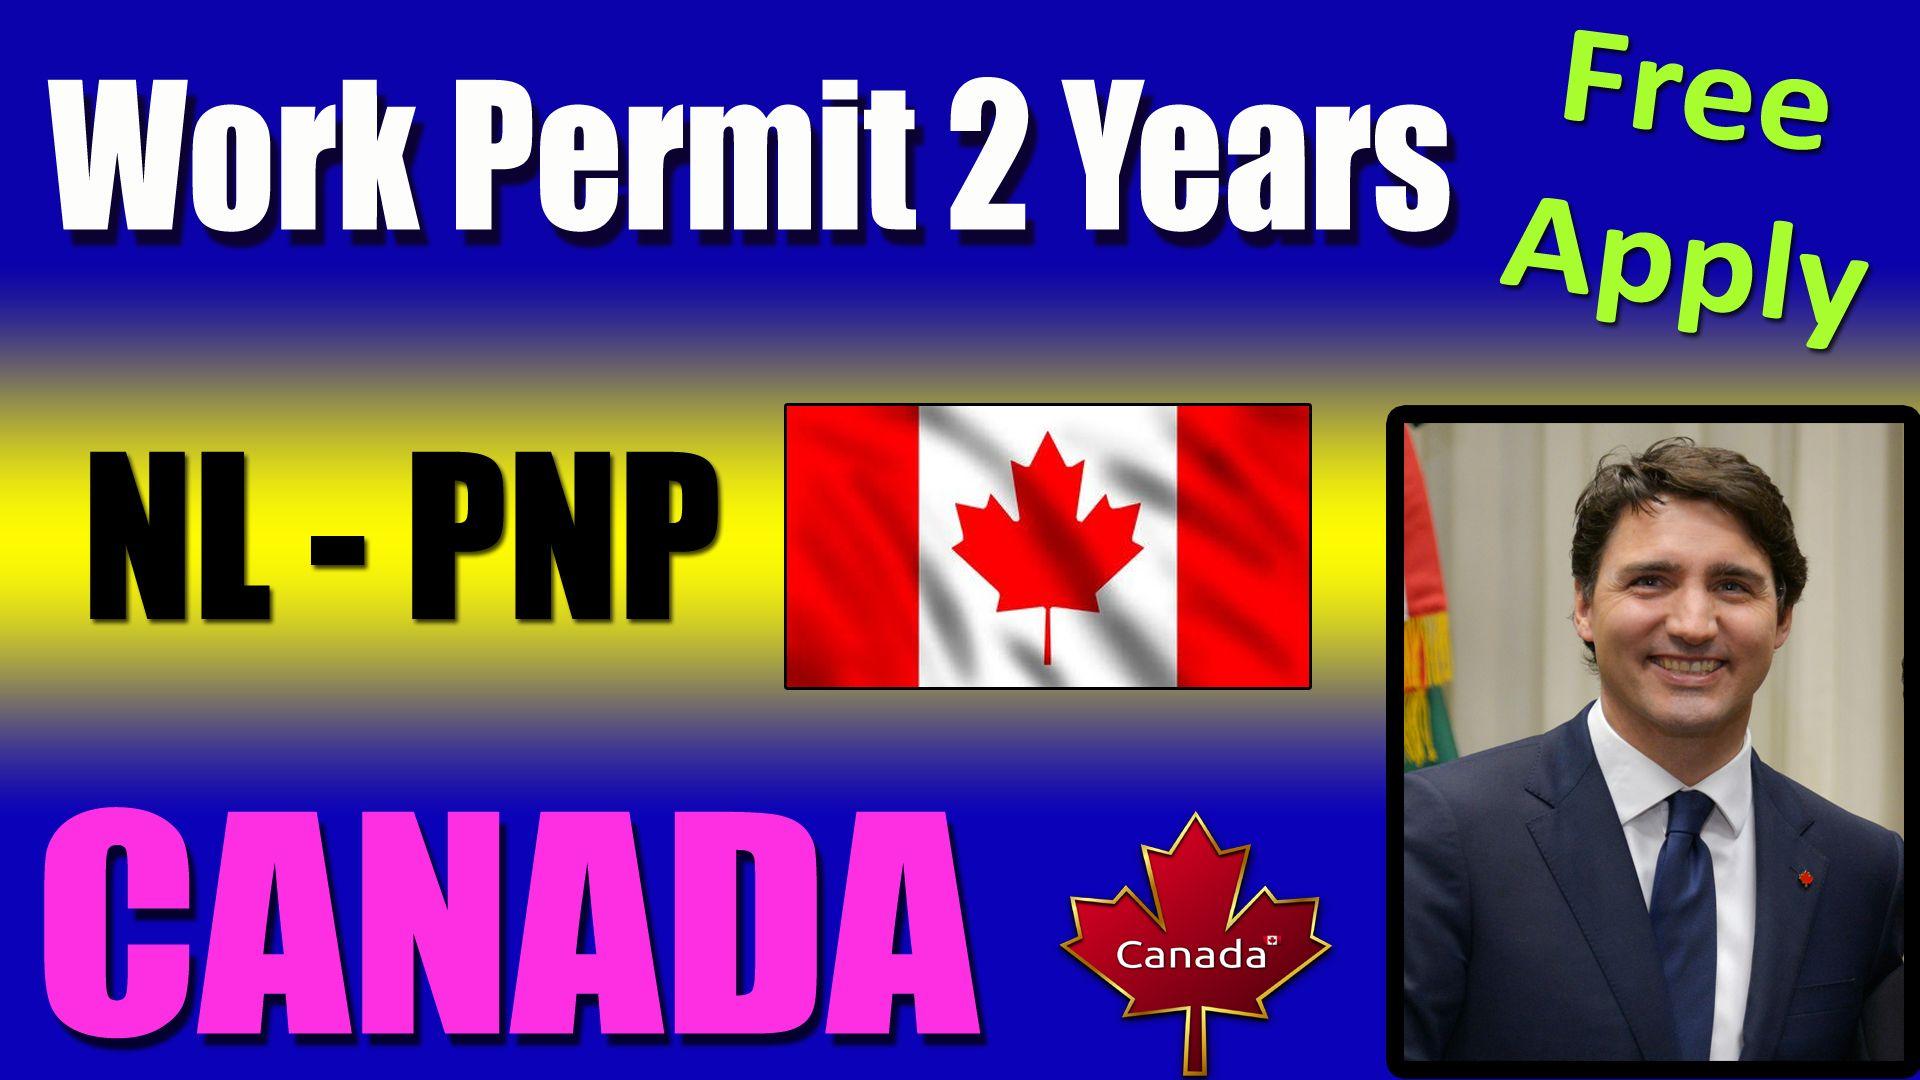 5b7ddc8f5e2571600f38223215d67da2 - How Long Does It Take To Get A Canadian Pr